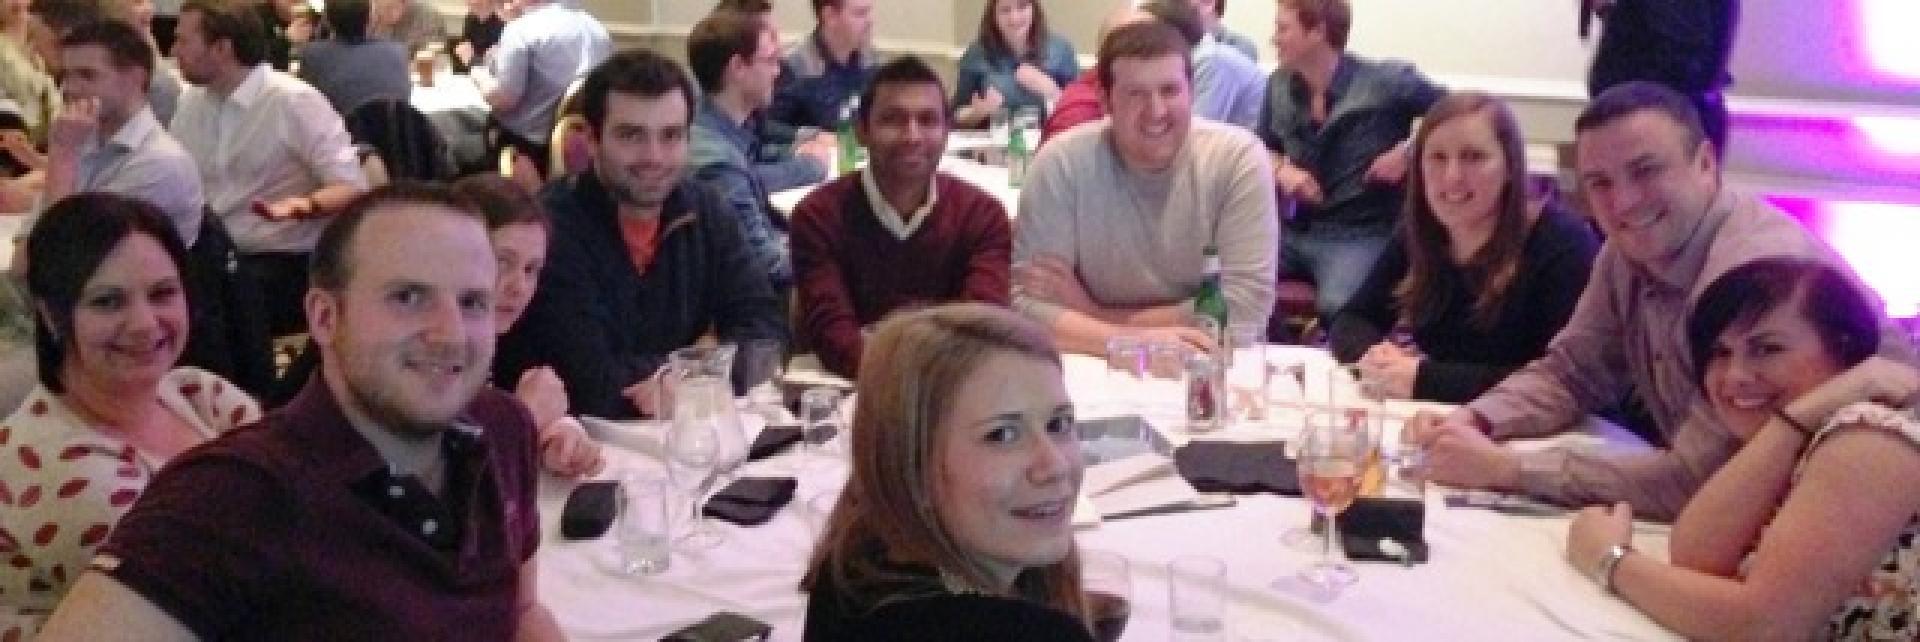 Evening Team Building Aberdeen Event with Technip